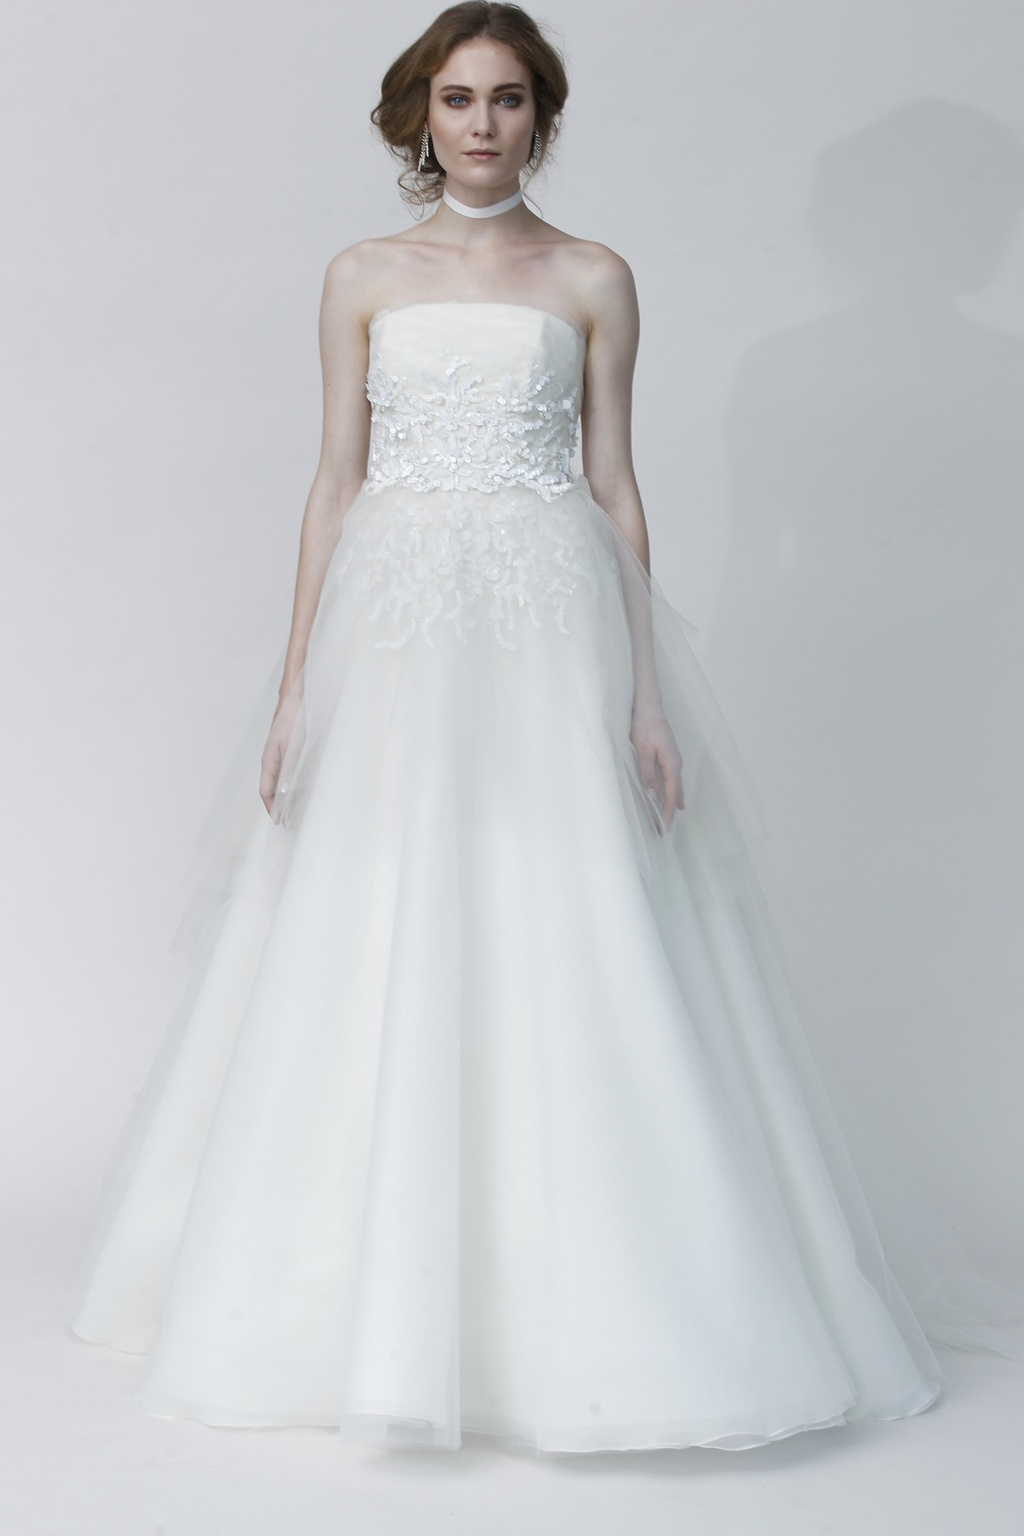 Giovanna-wedding-dress-by-rivini-fall-2014-bridal.full